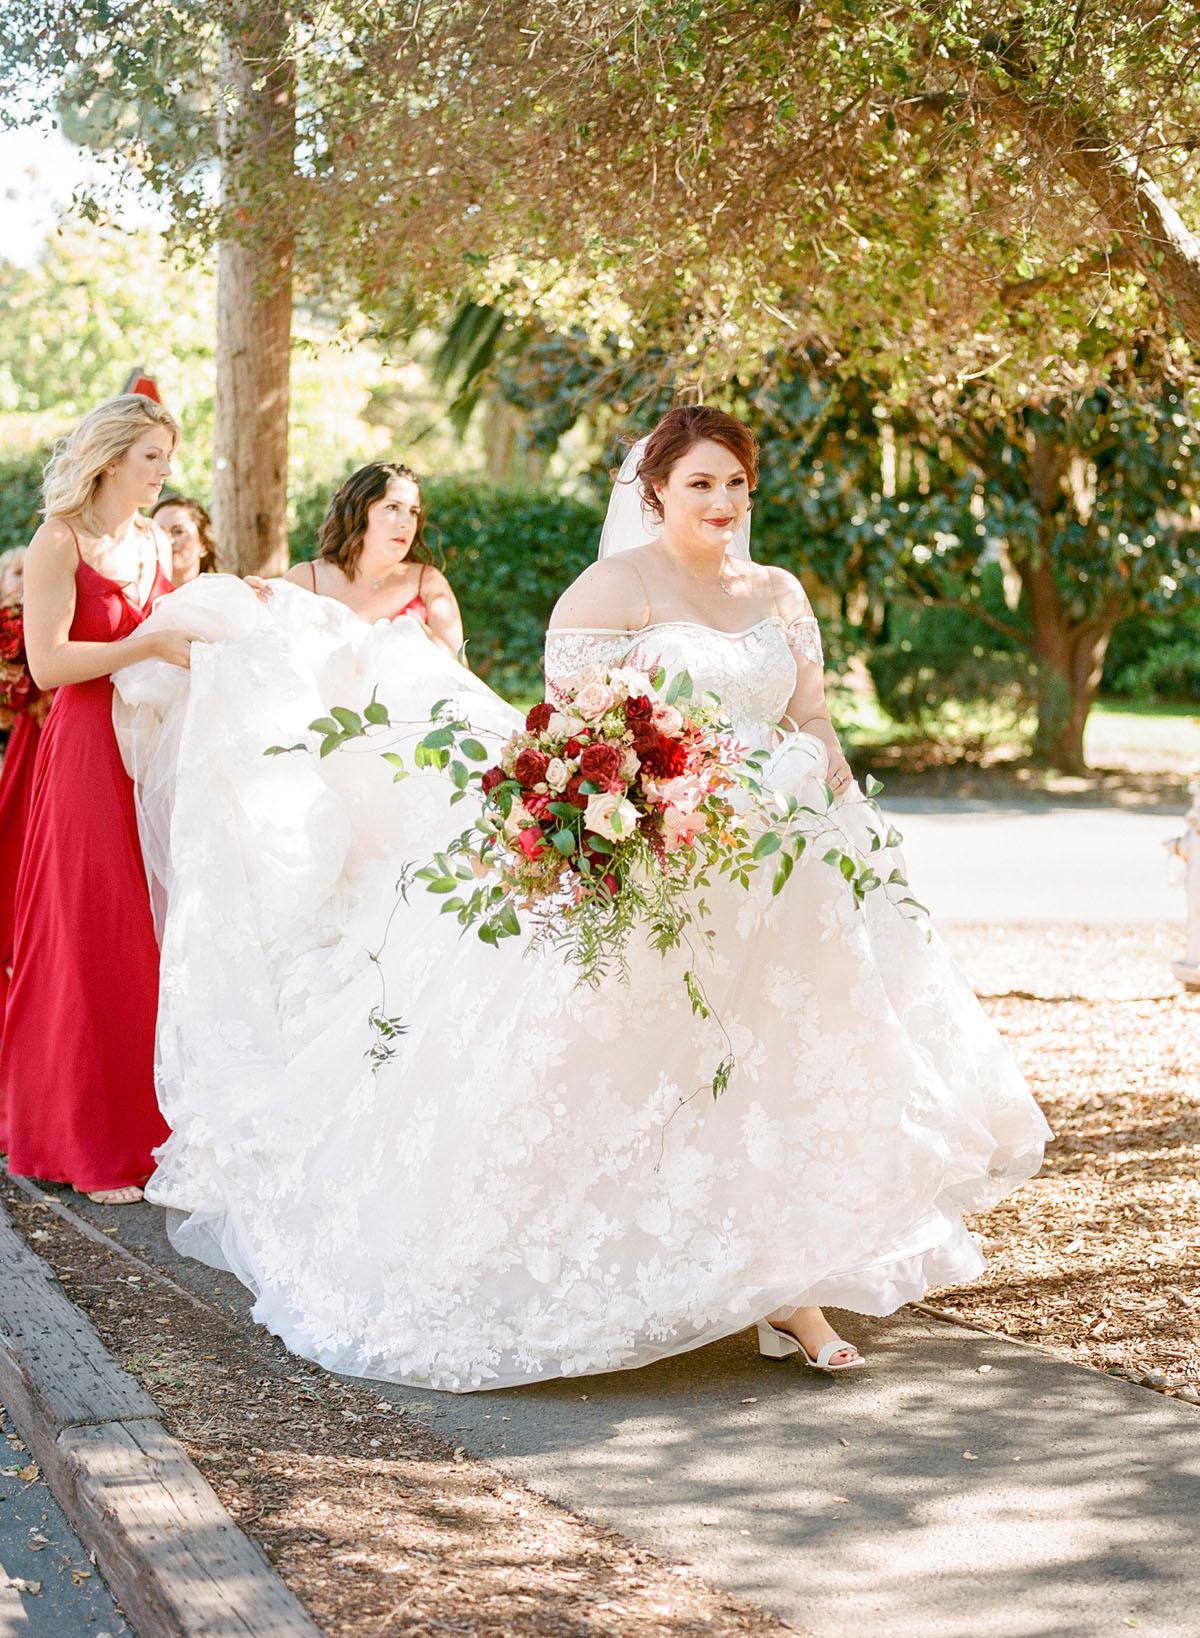 7-bride-walking-yountville.jpg